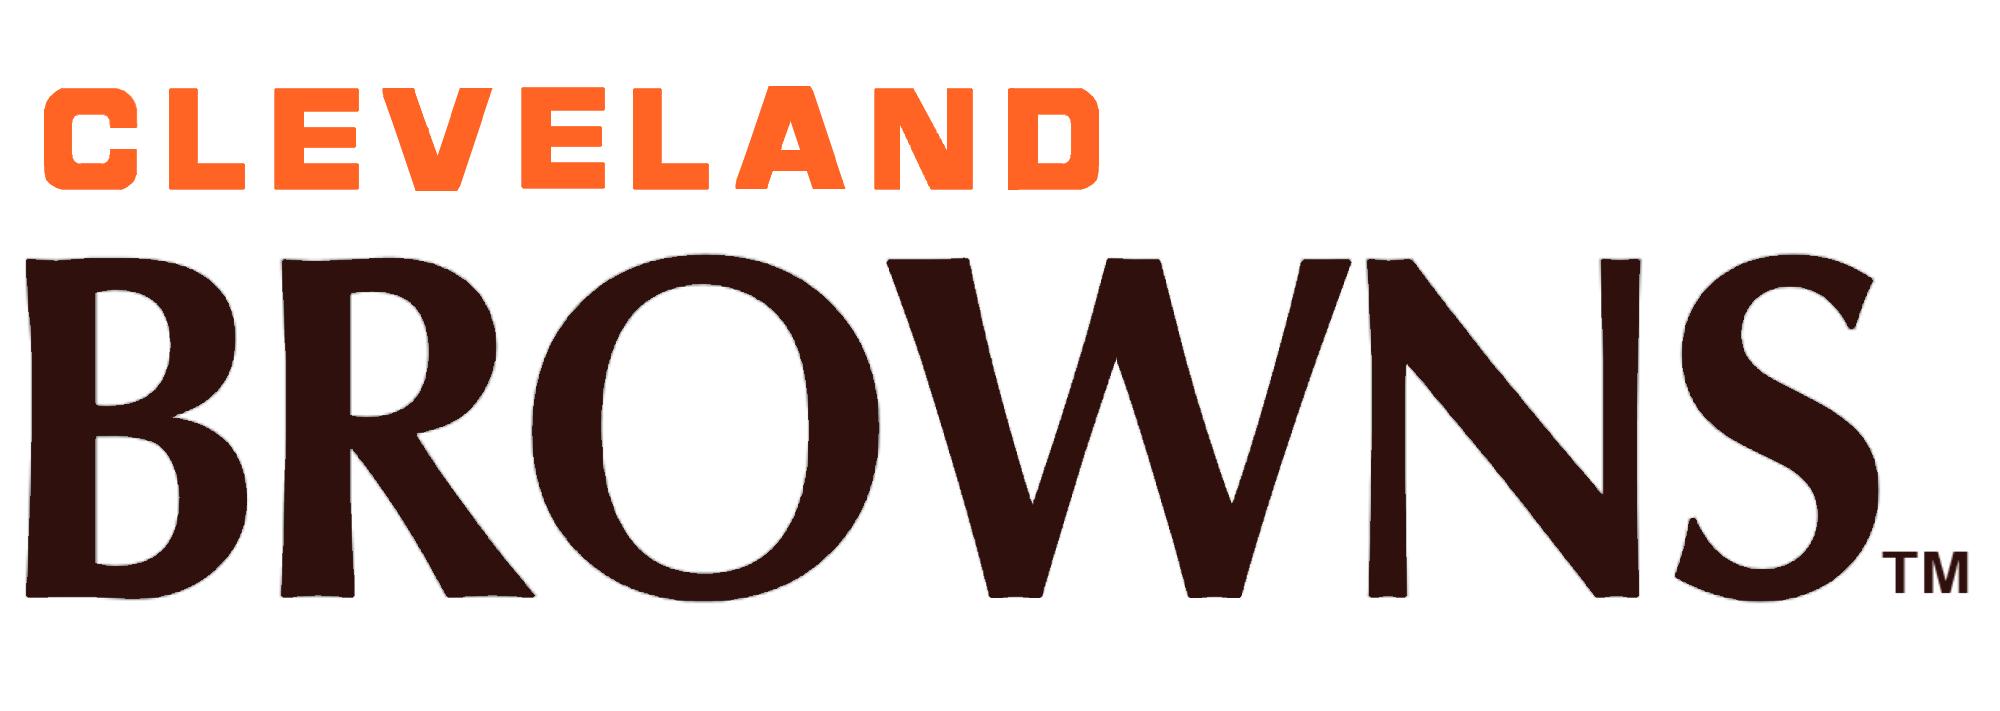 1975-1995_Browns_Script.PNG